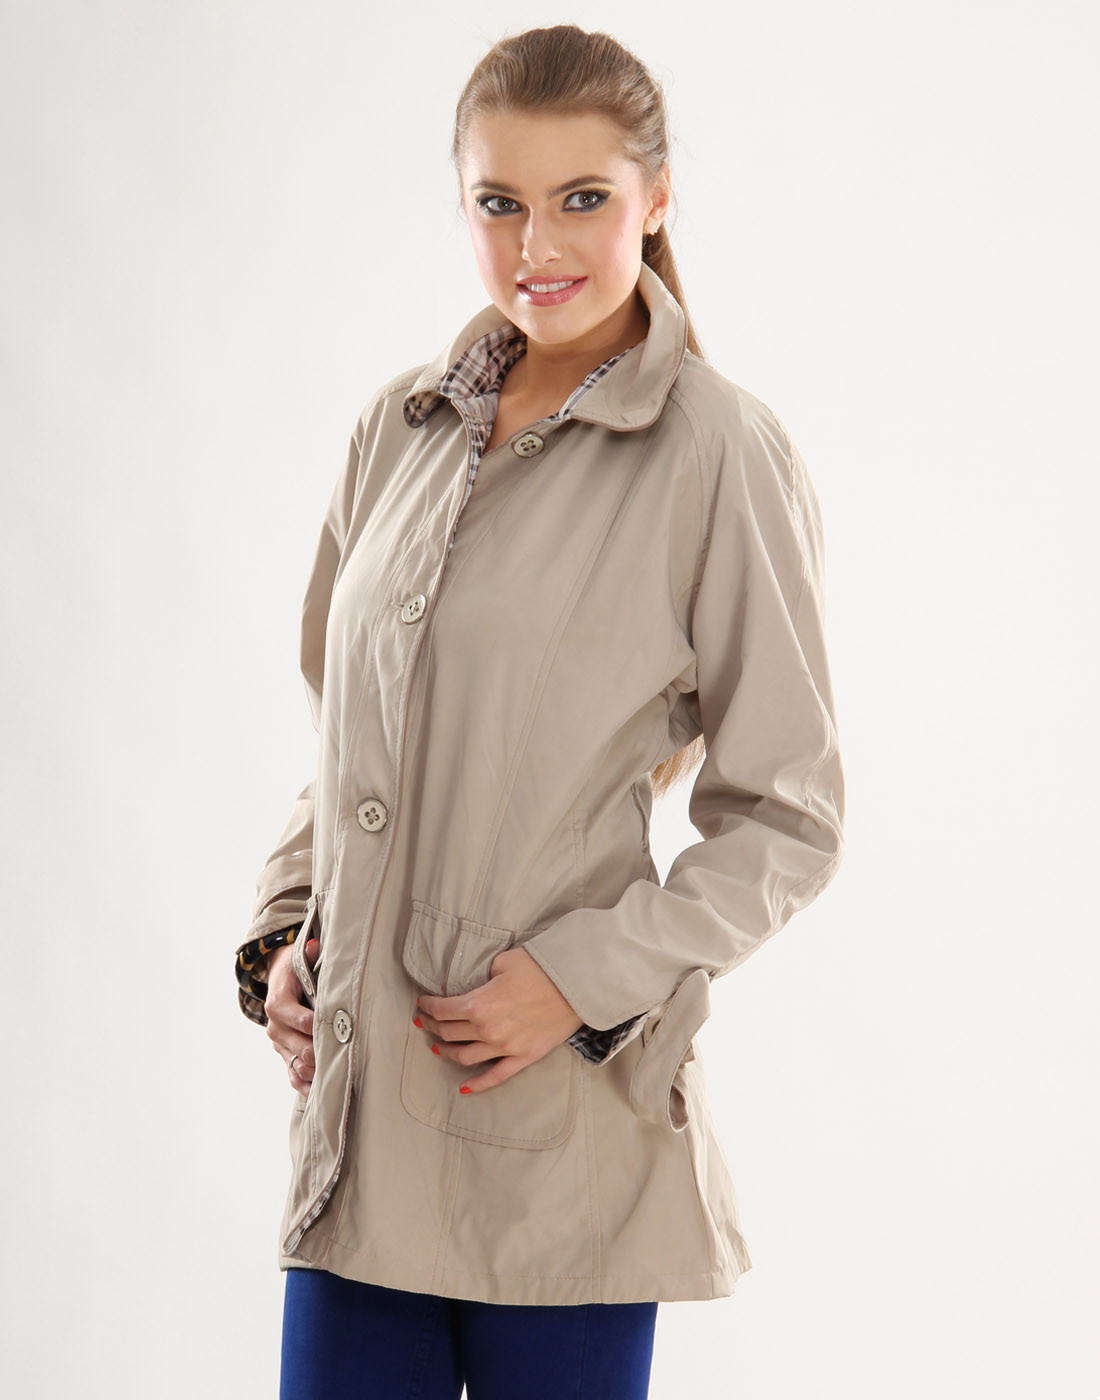 Sportelle USA India Full Sleeve Solid Womens Jacket